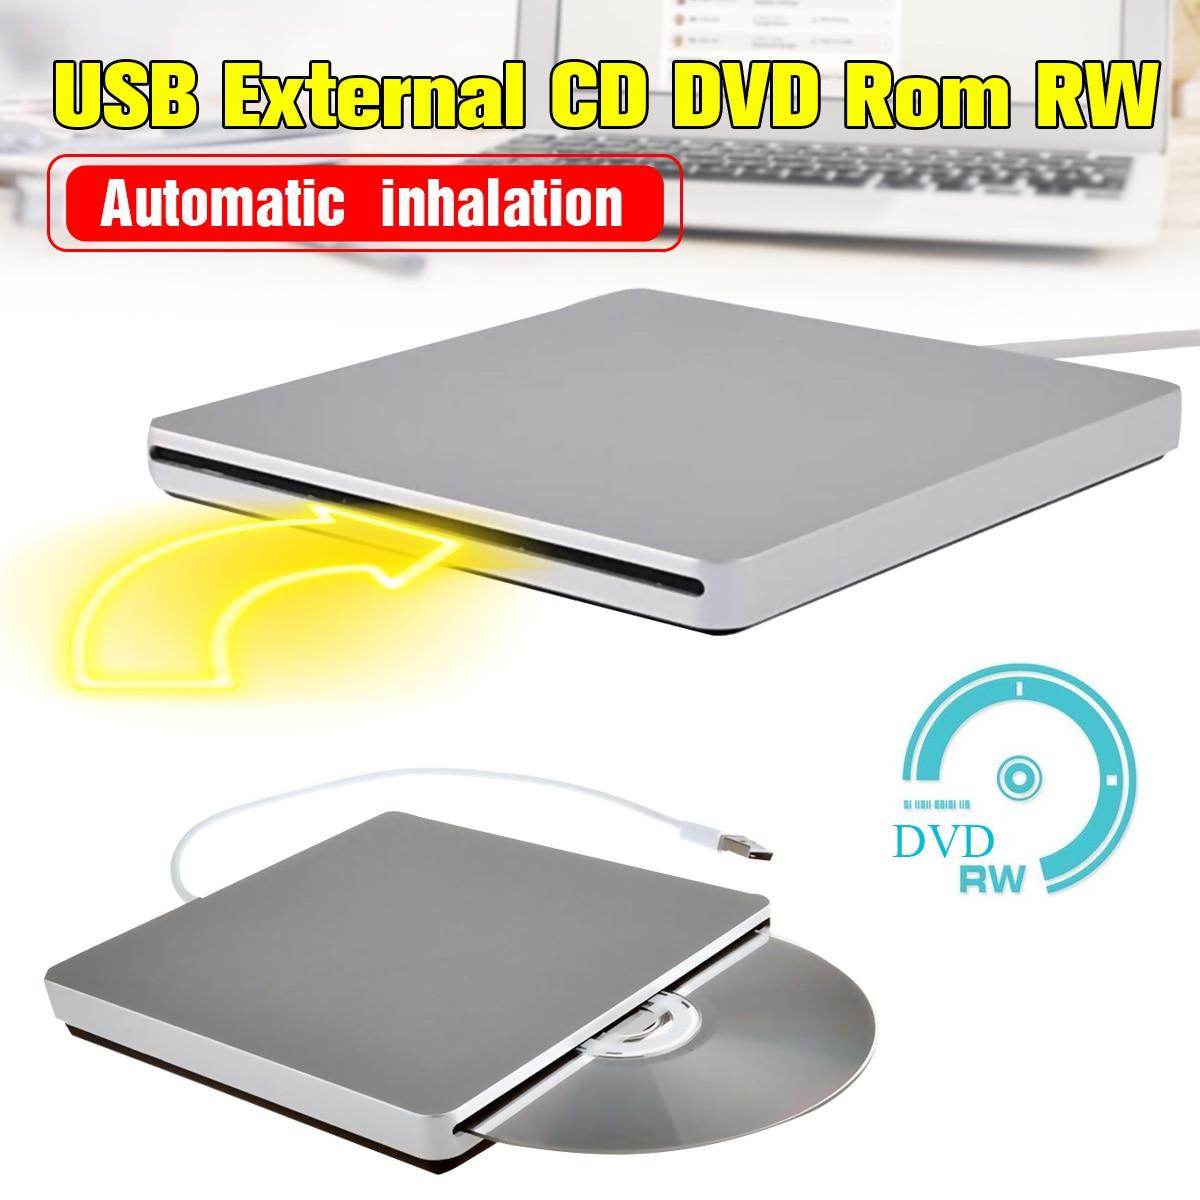 Ultra Slim portátil USB 2.0 Externo Slot-in CD DVD Rom RW Jogador Burner Drive para iMac/MacBook win8 ar para Mac Laptop Notebook